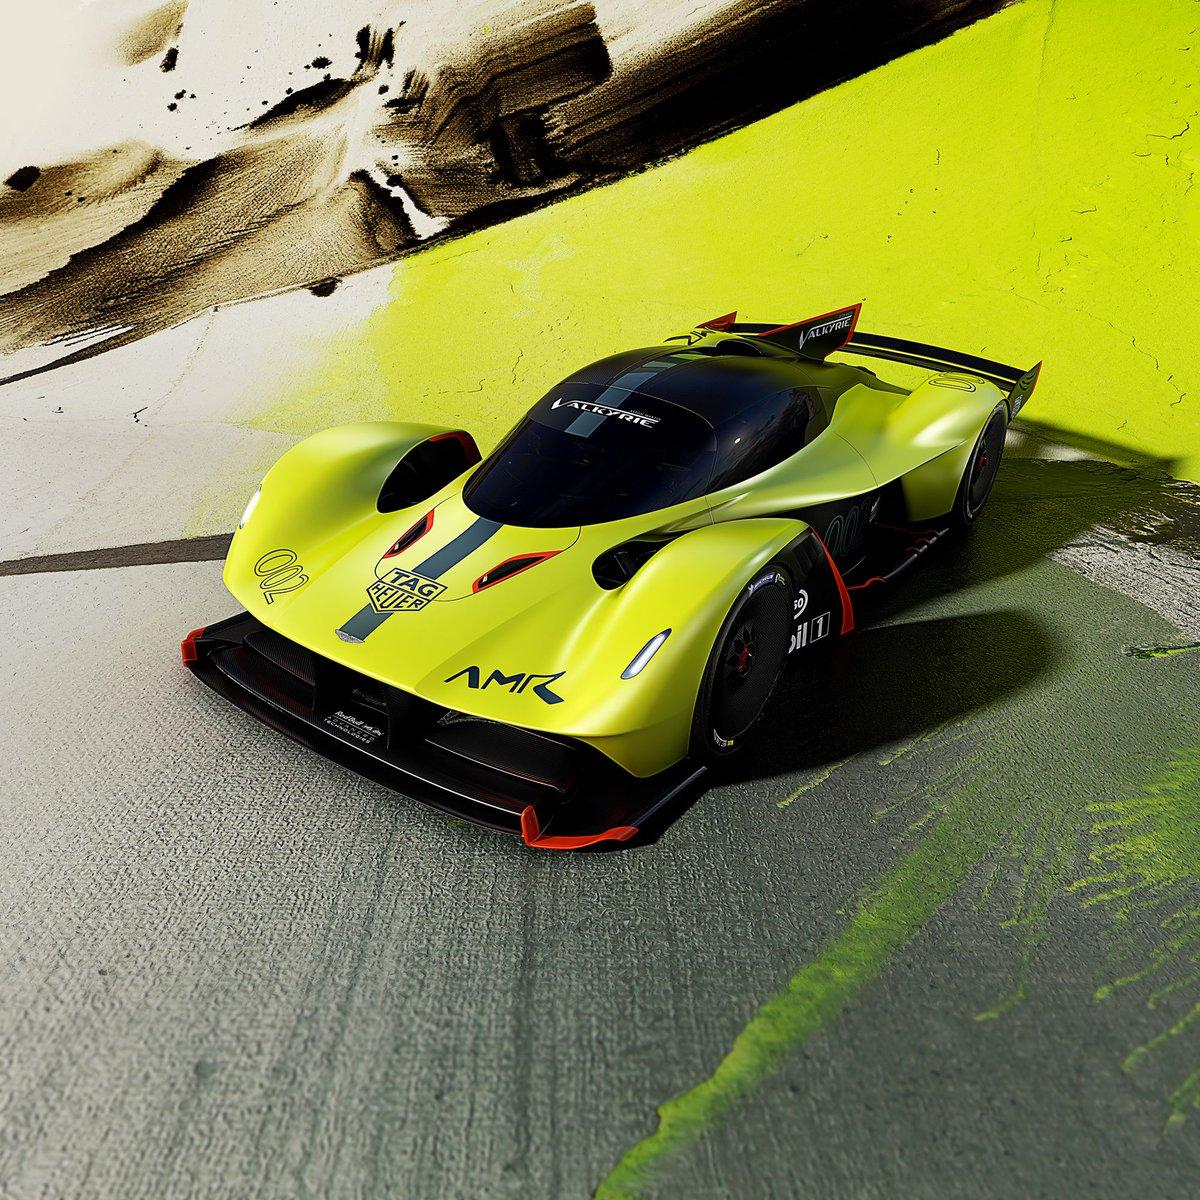 The Verge On Twitter Aston Martin S New Hypercar Is An 1 100 Horsepower Asphalt Rocket Https T Co Xmjzcxflvp